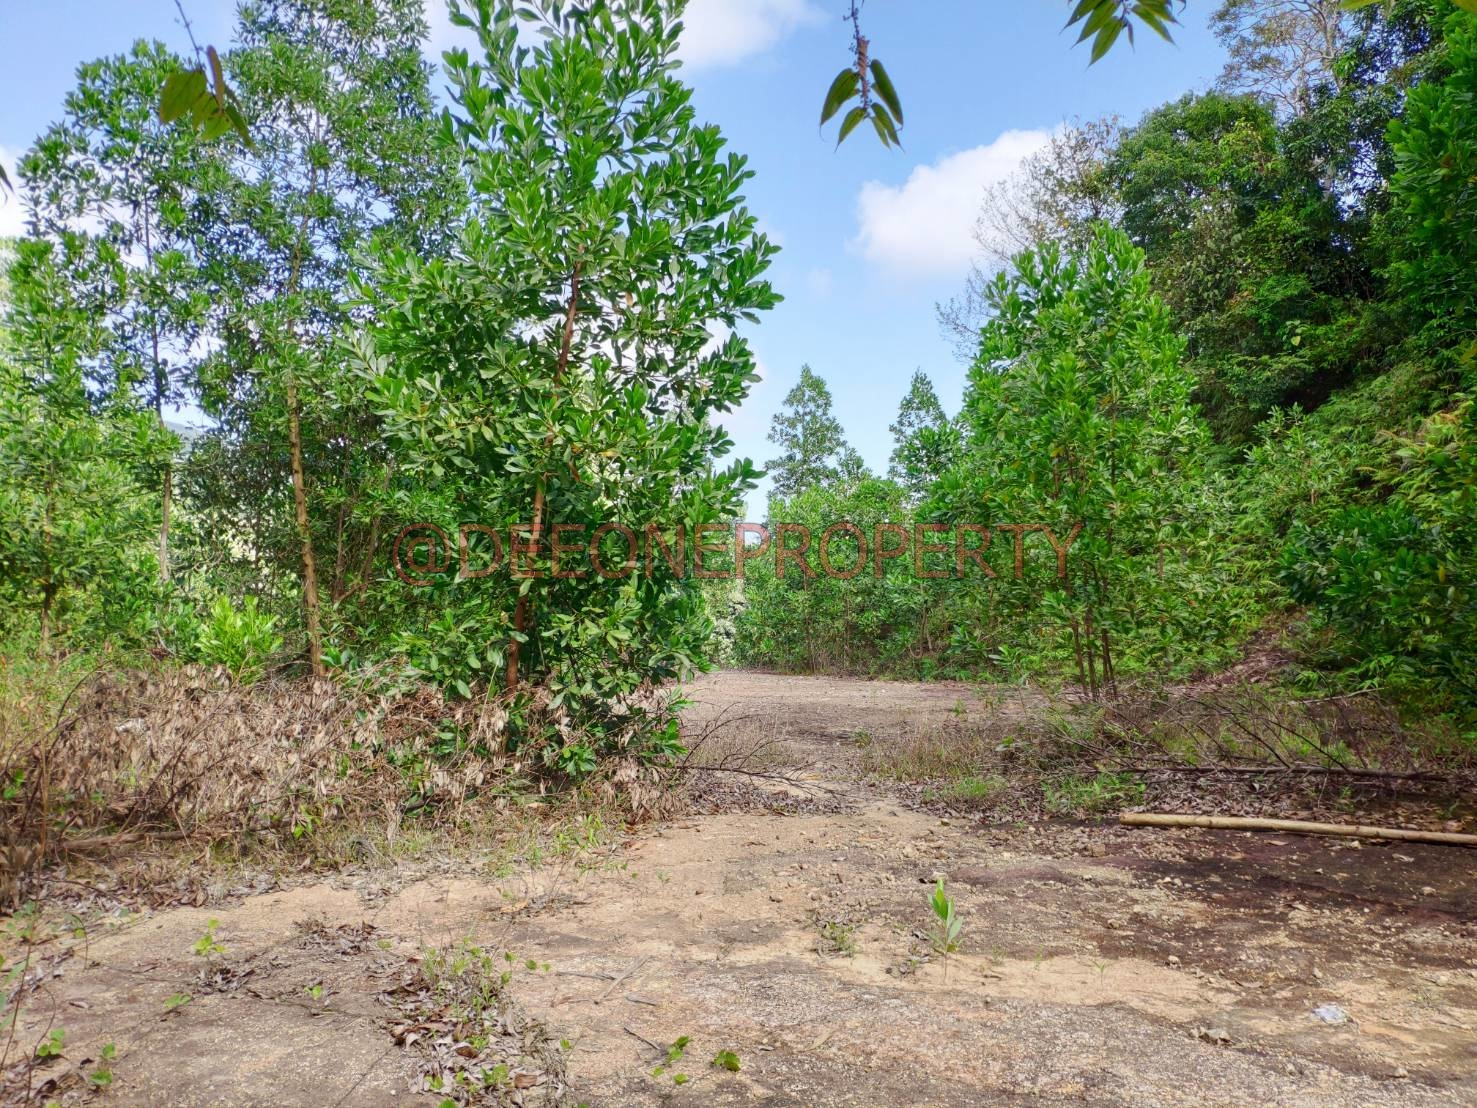 6 Rai+ Land Near Sea for Sale – Koh Chang West Coast (South)